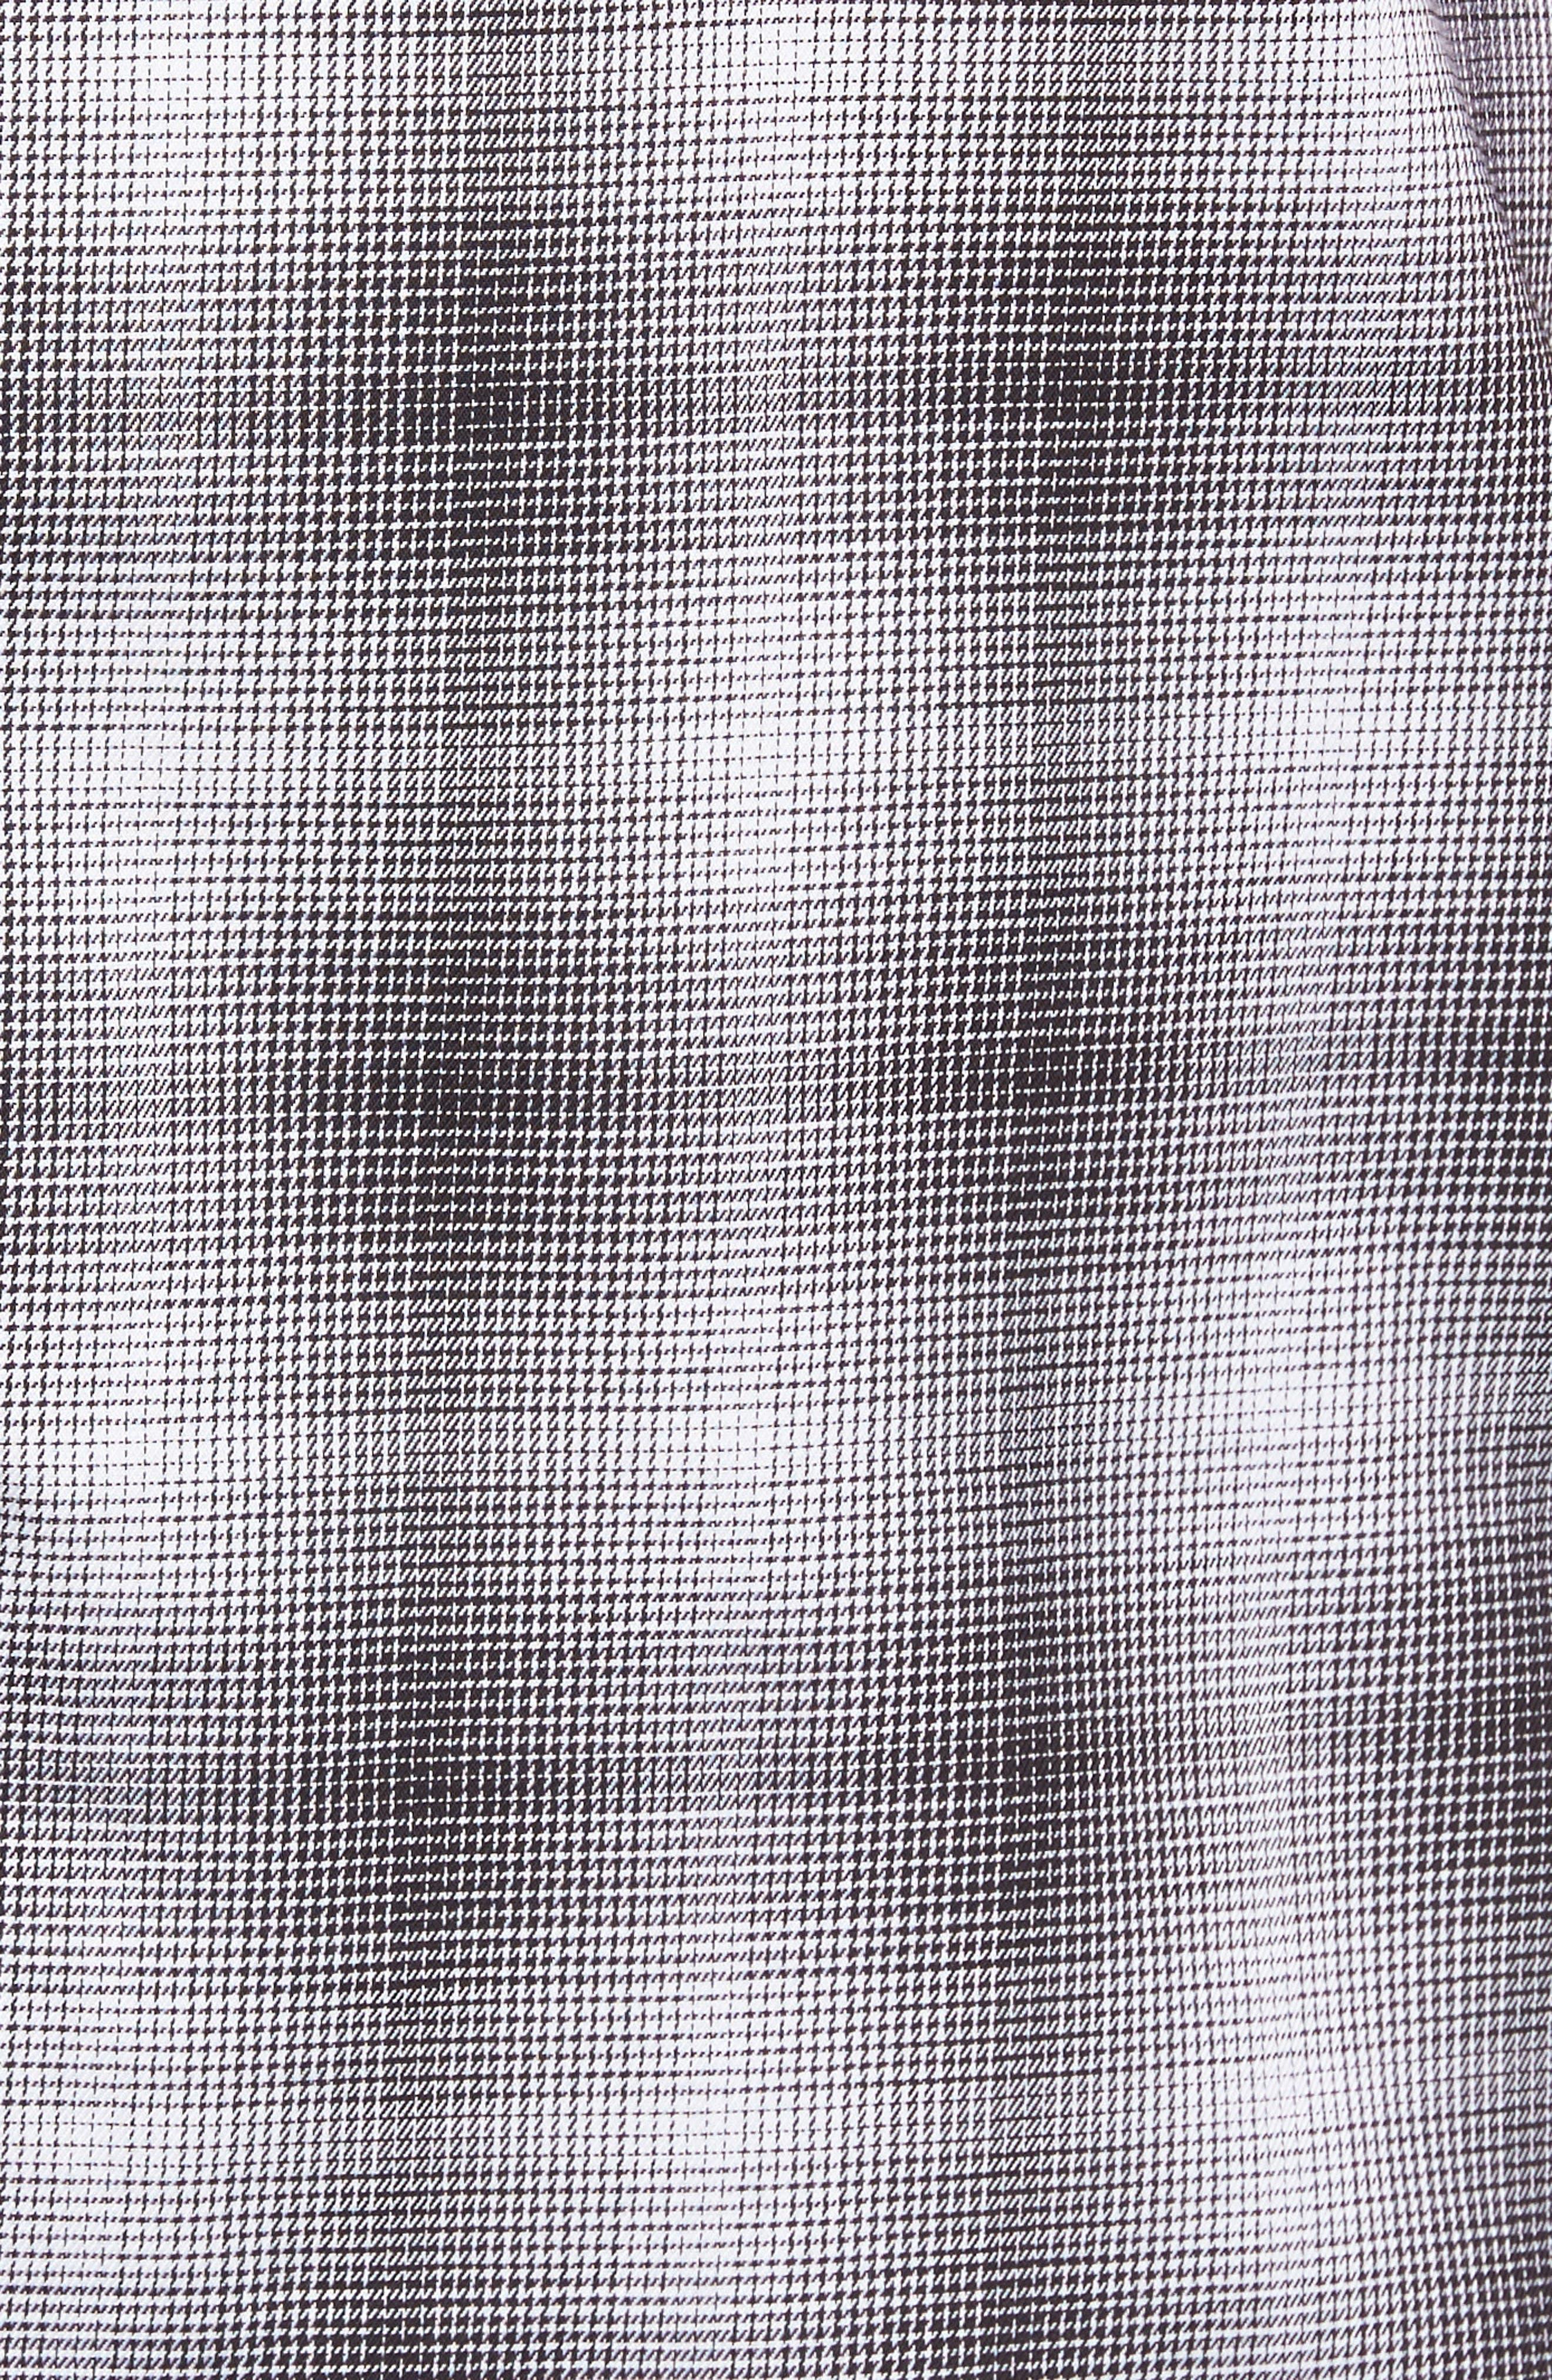 Non-Iron Moiré Plaid Woven Shirt,                             Alternate thumbnail 6, color,                             Black Houndstooth Plaid